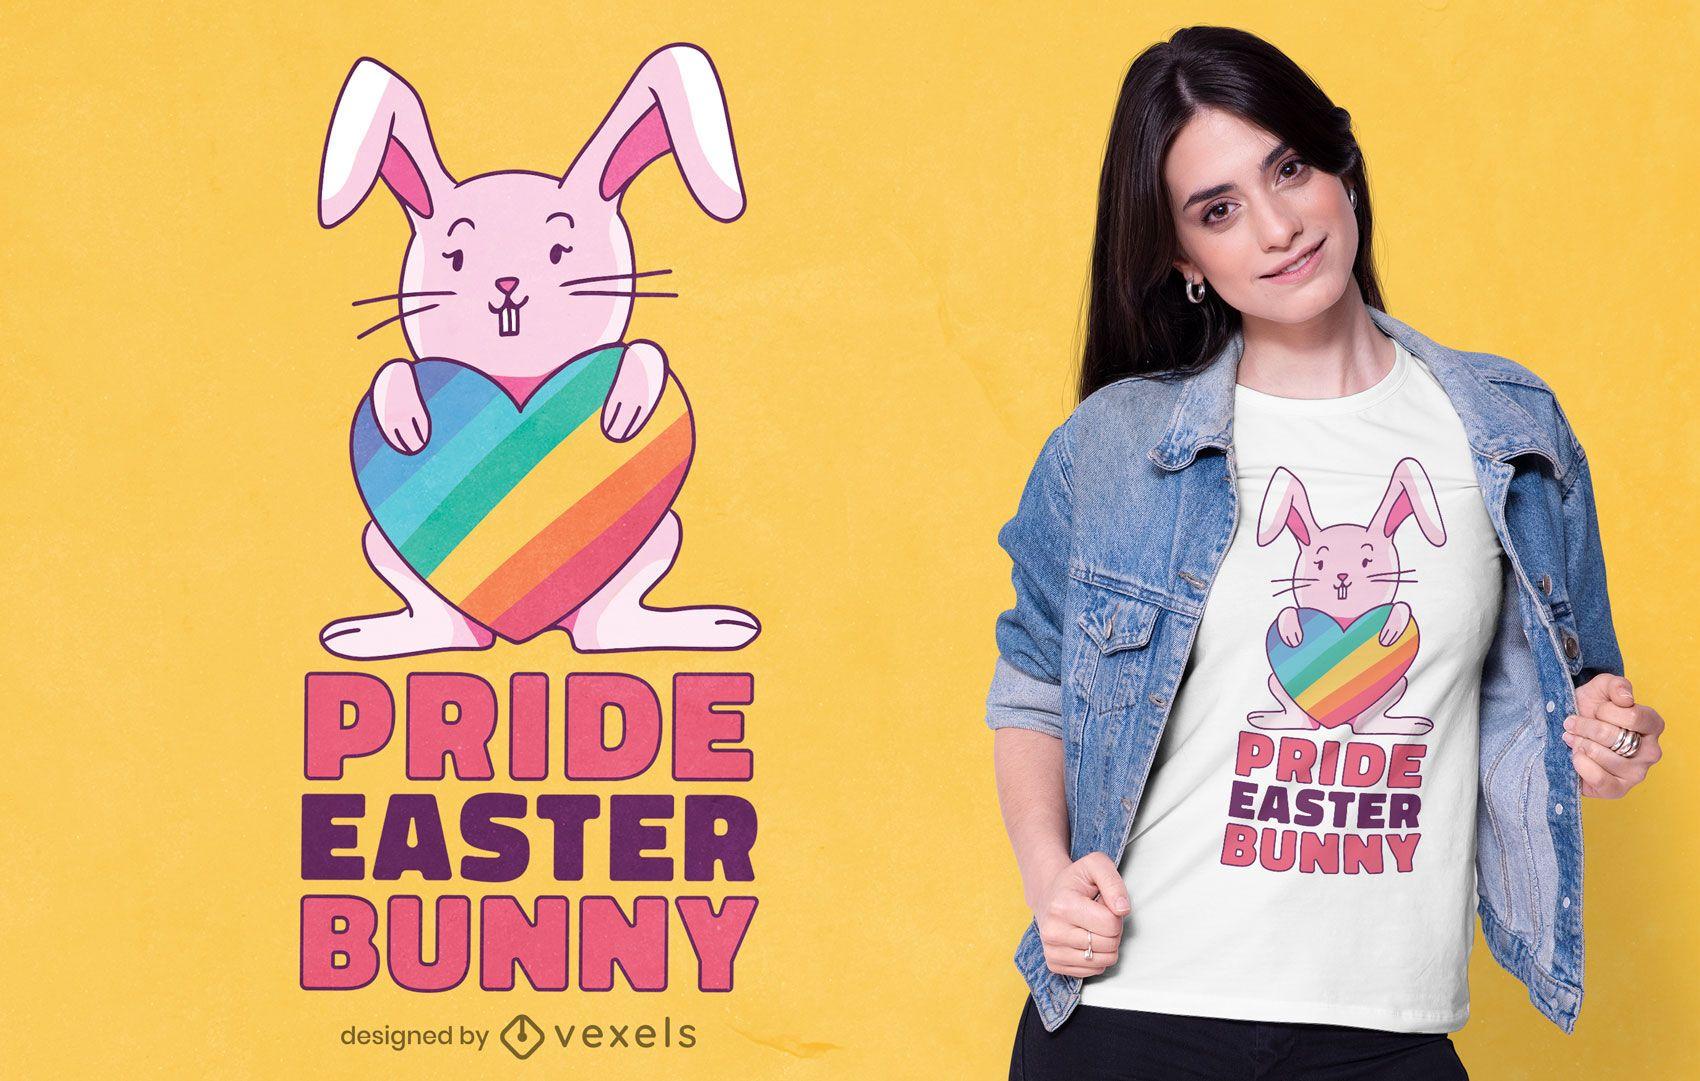 Pride Easter bunny t-shirt design